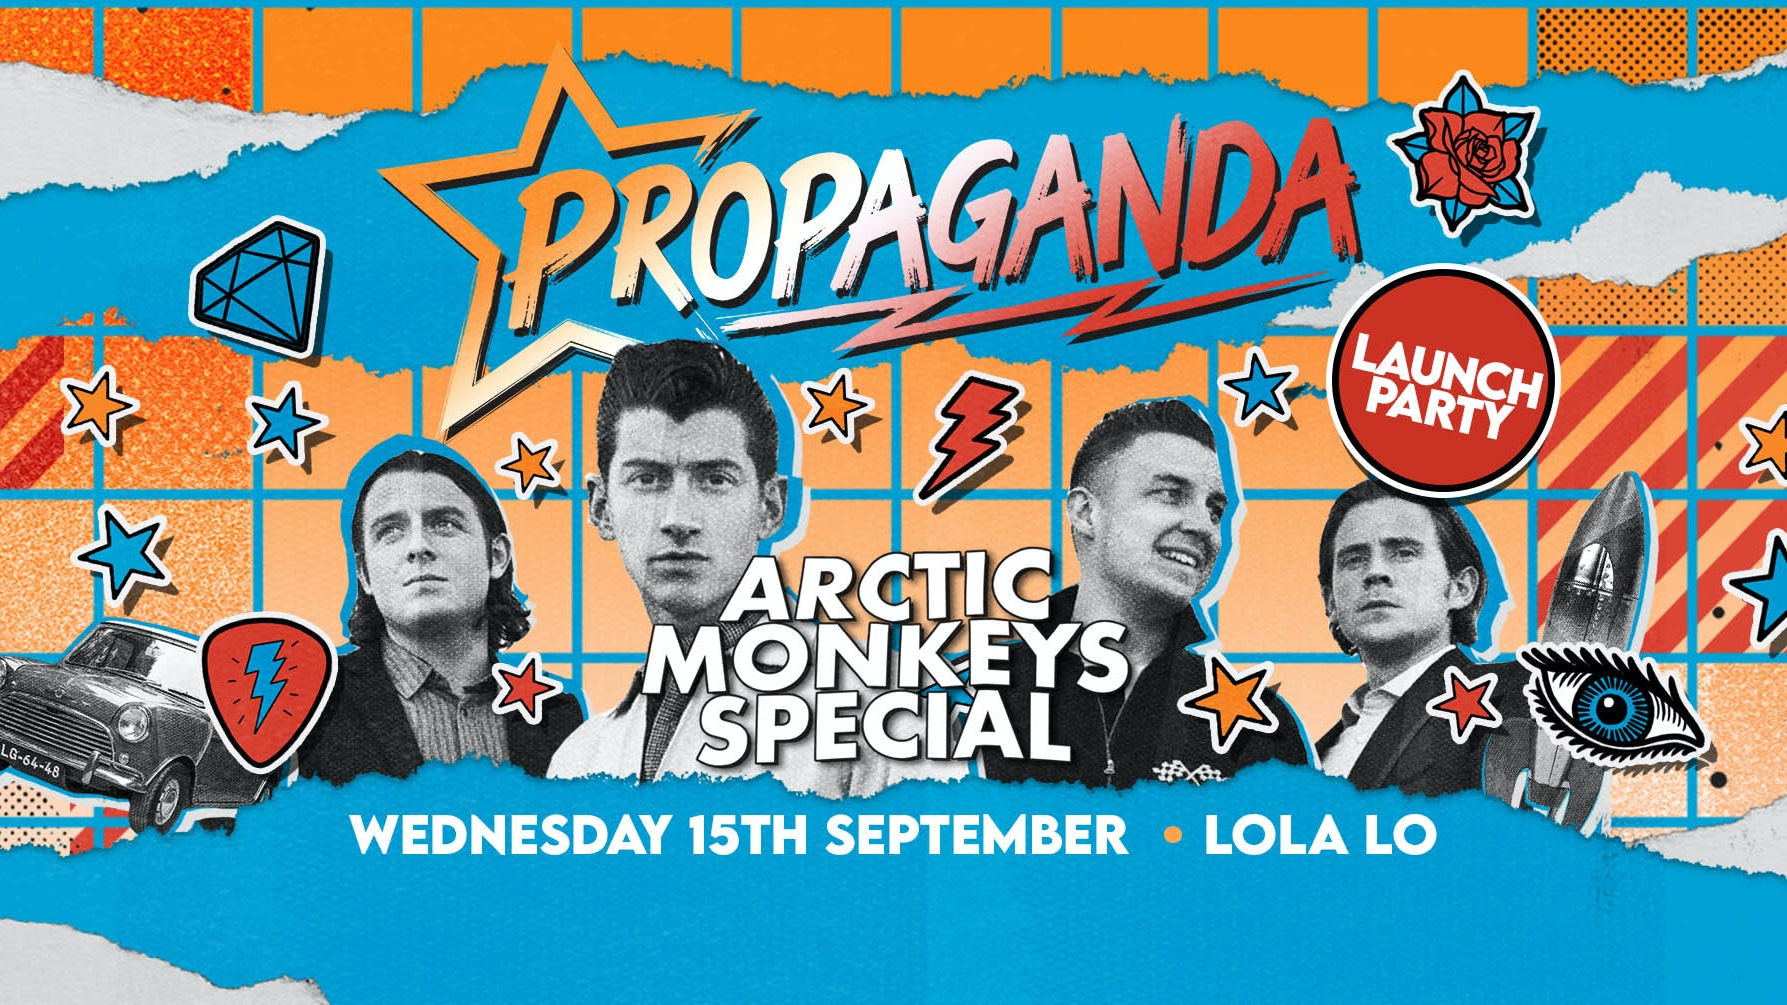 Propaganda Cambridge – Arctic Monkeys Launch Party at Lola Lo!